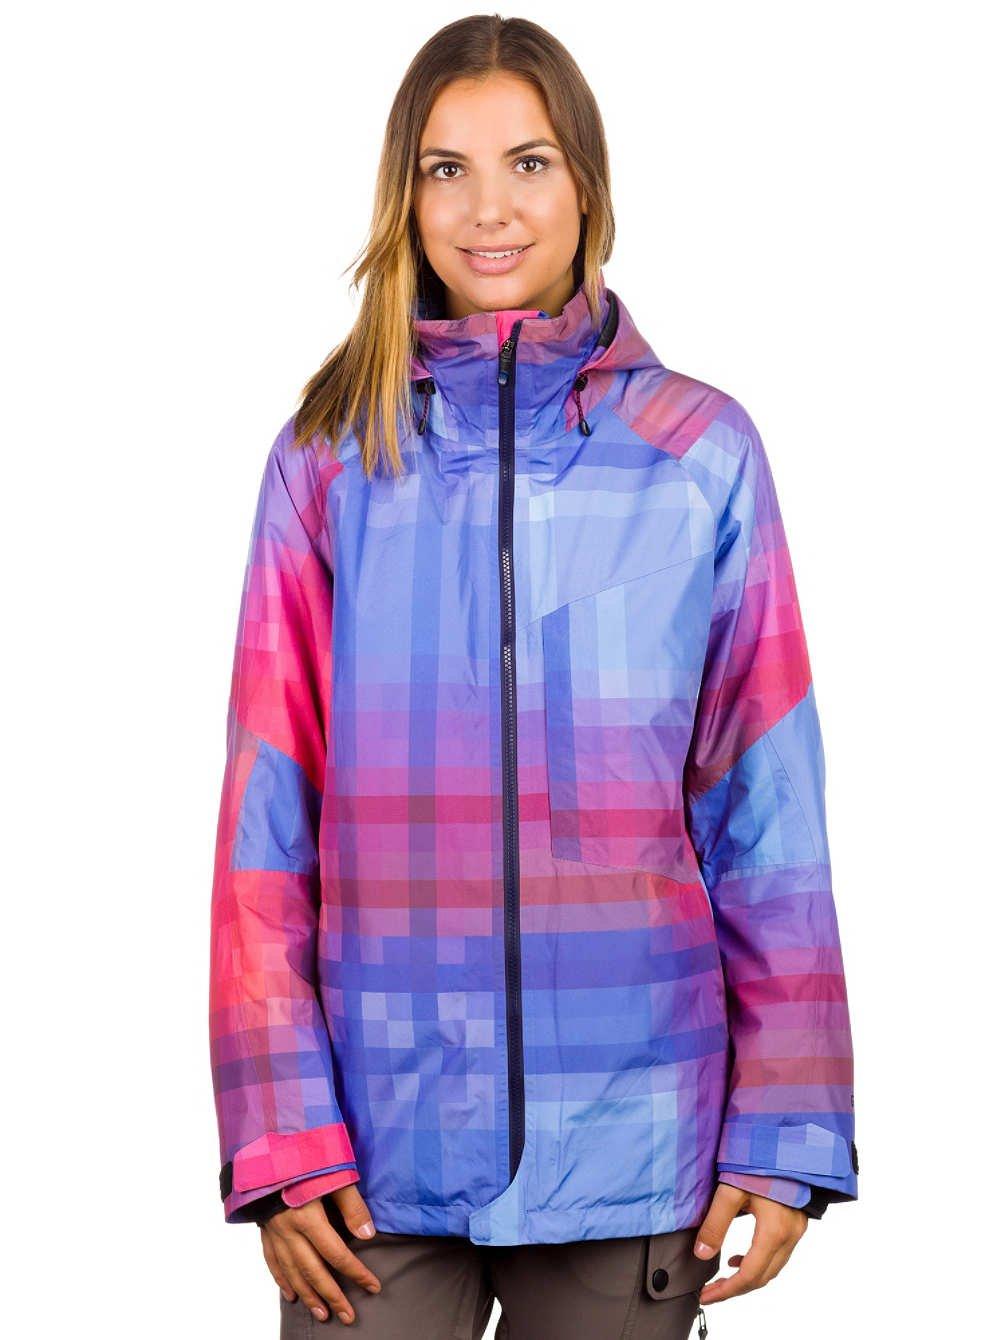 Burton Damen Snowboardjacke W AK 2L Embark Jacket jetzt kaufen